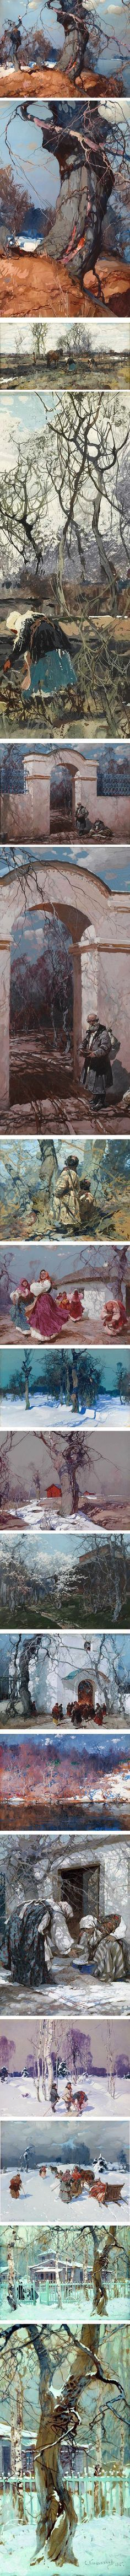 Stepan Kolesnikoff (Kolesnikov), Ukrainian, Russian Yugoslav artist gouache and oil